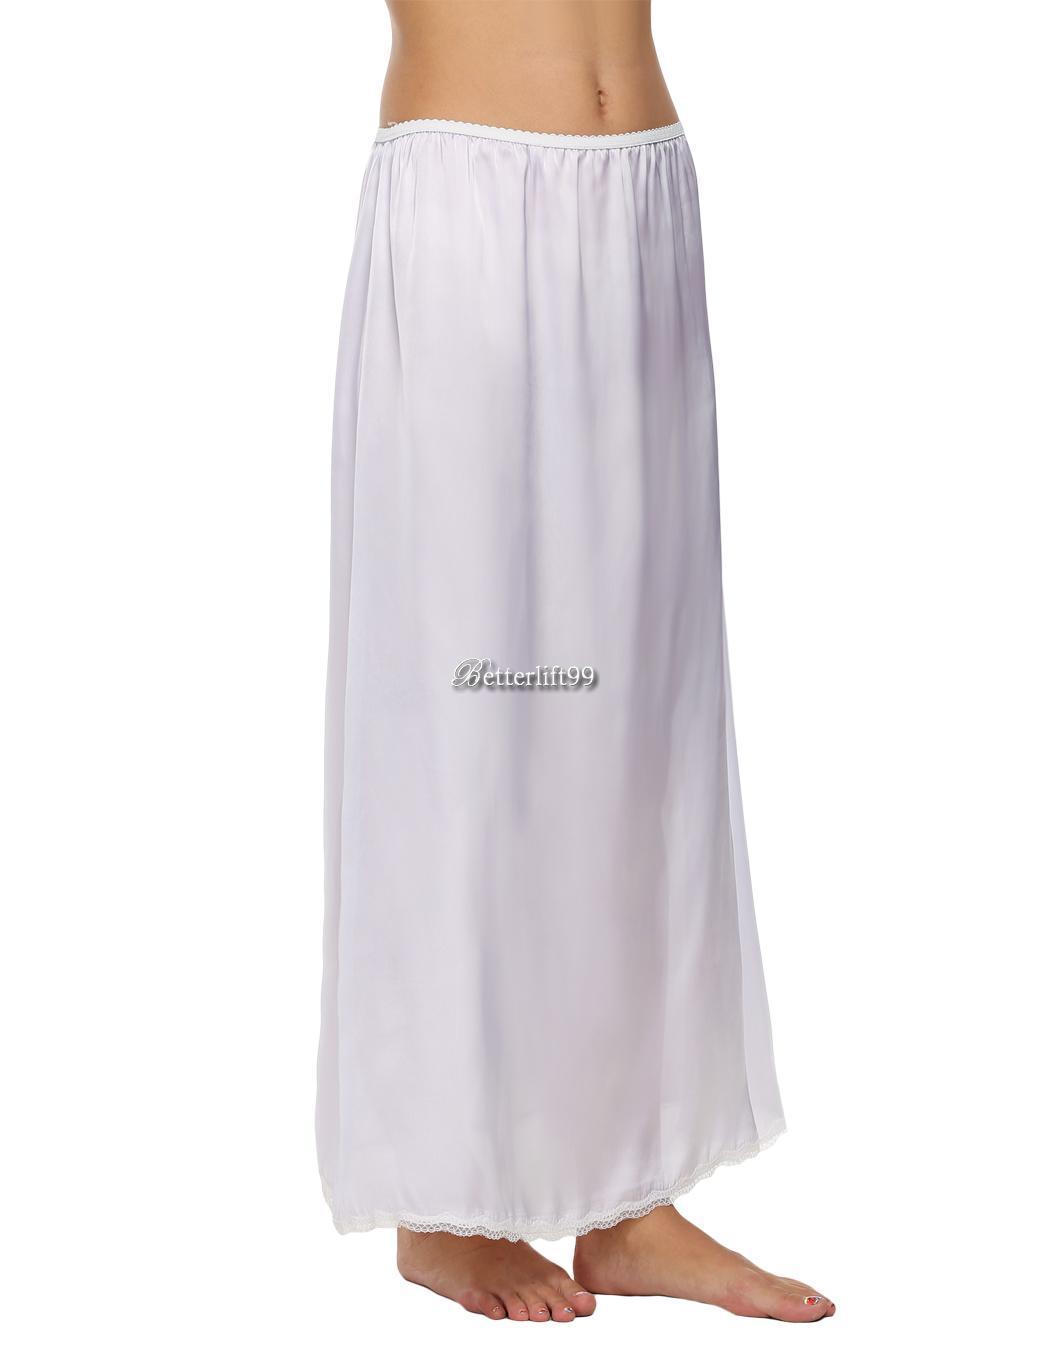 36f9c96440bf6 Details about Avidlove Women Satin Solid Lace Trim Maxi Half Slip  Underskirt Slip Skirt BF901